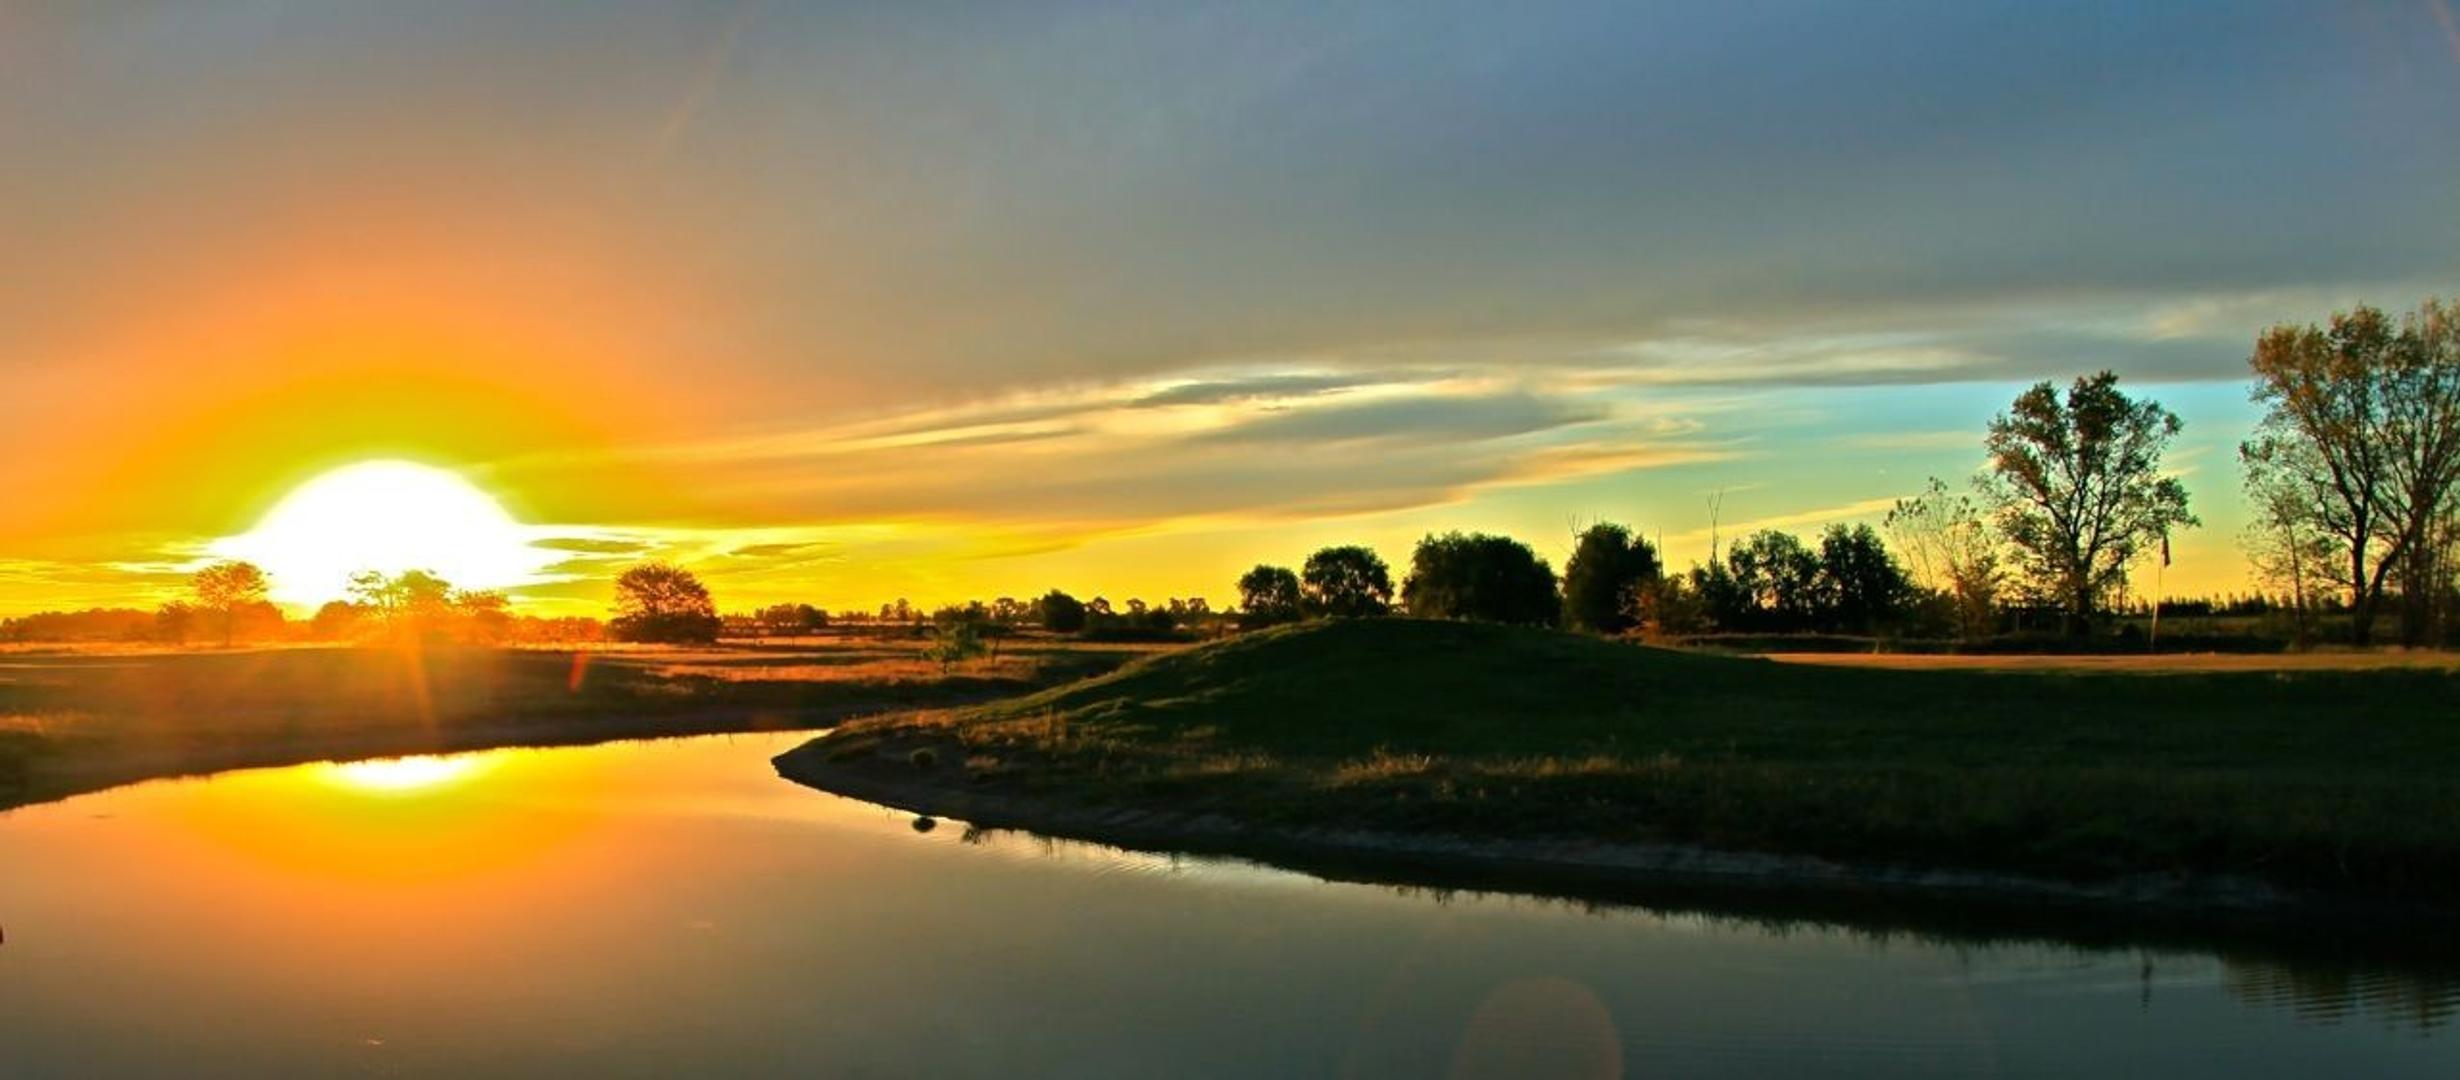 Tizado Pilar Lote terreno en venta con Golf en Medal Pilar - PIL3858_LP174104_1